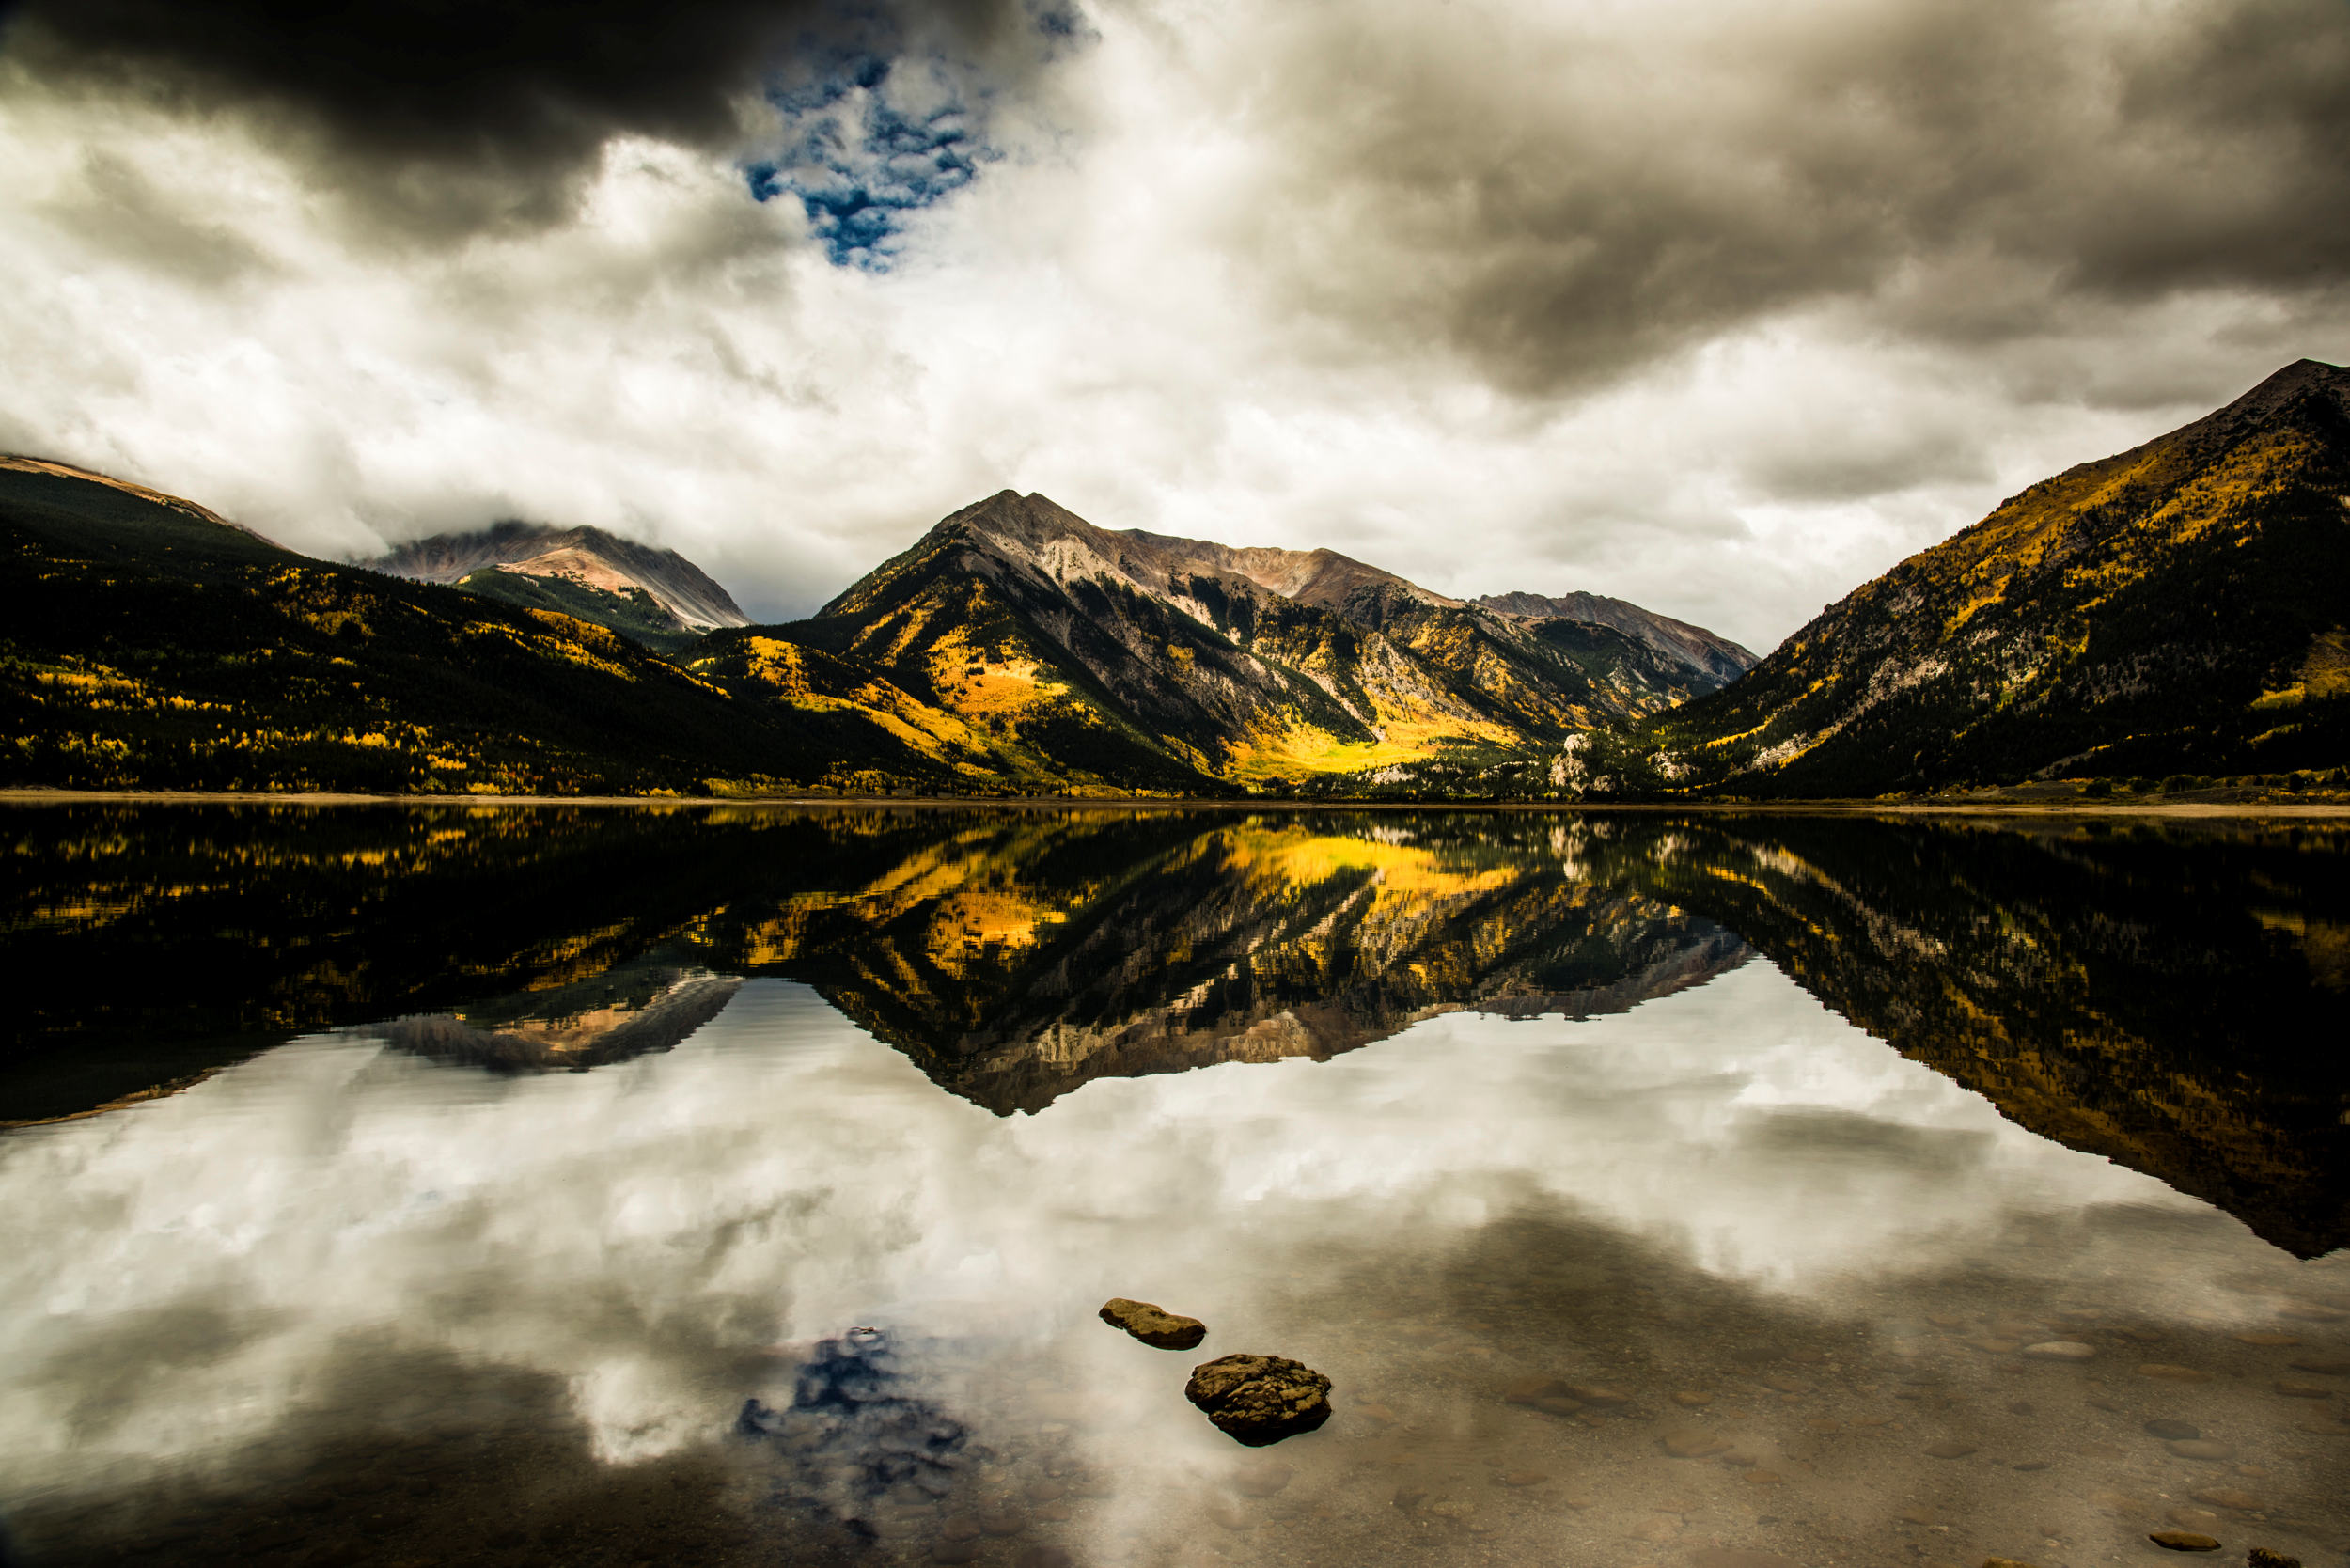 Twin Lakes Reflection I